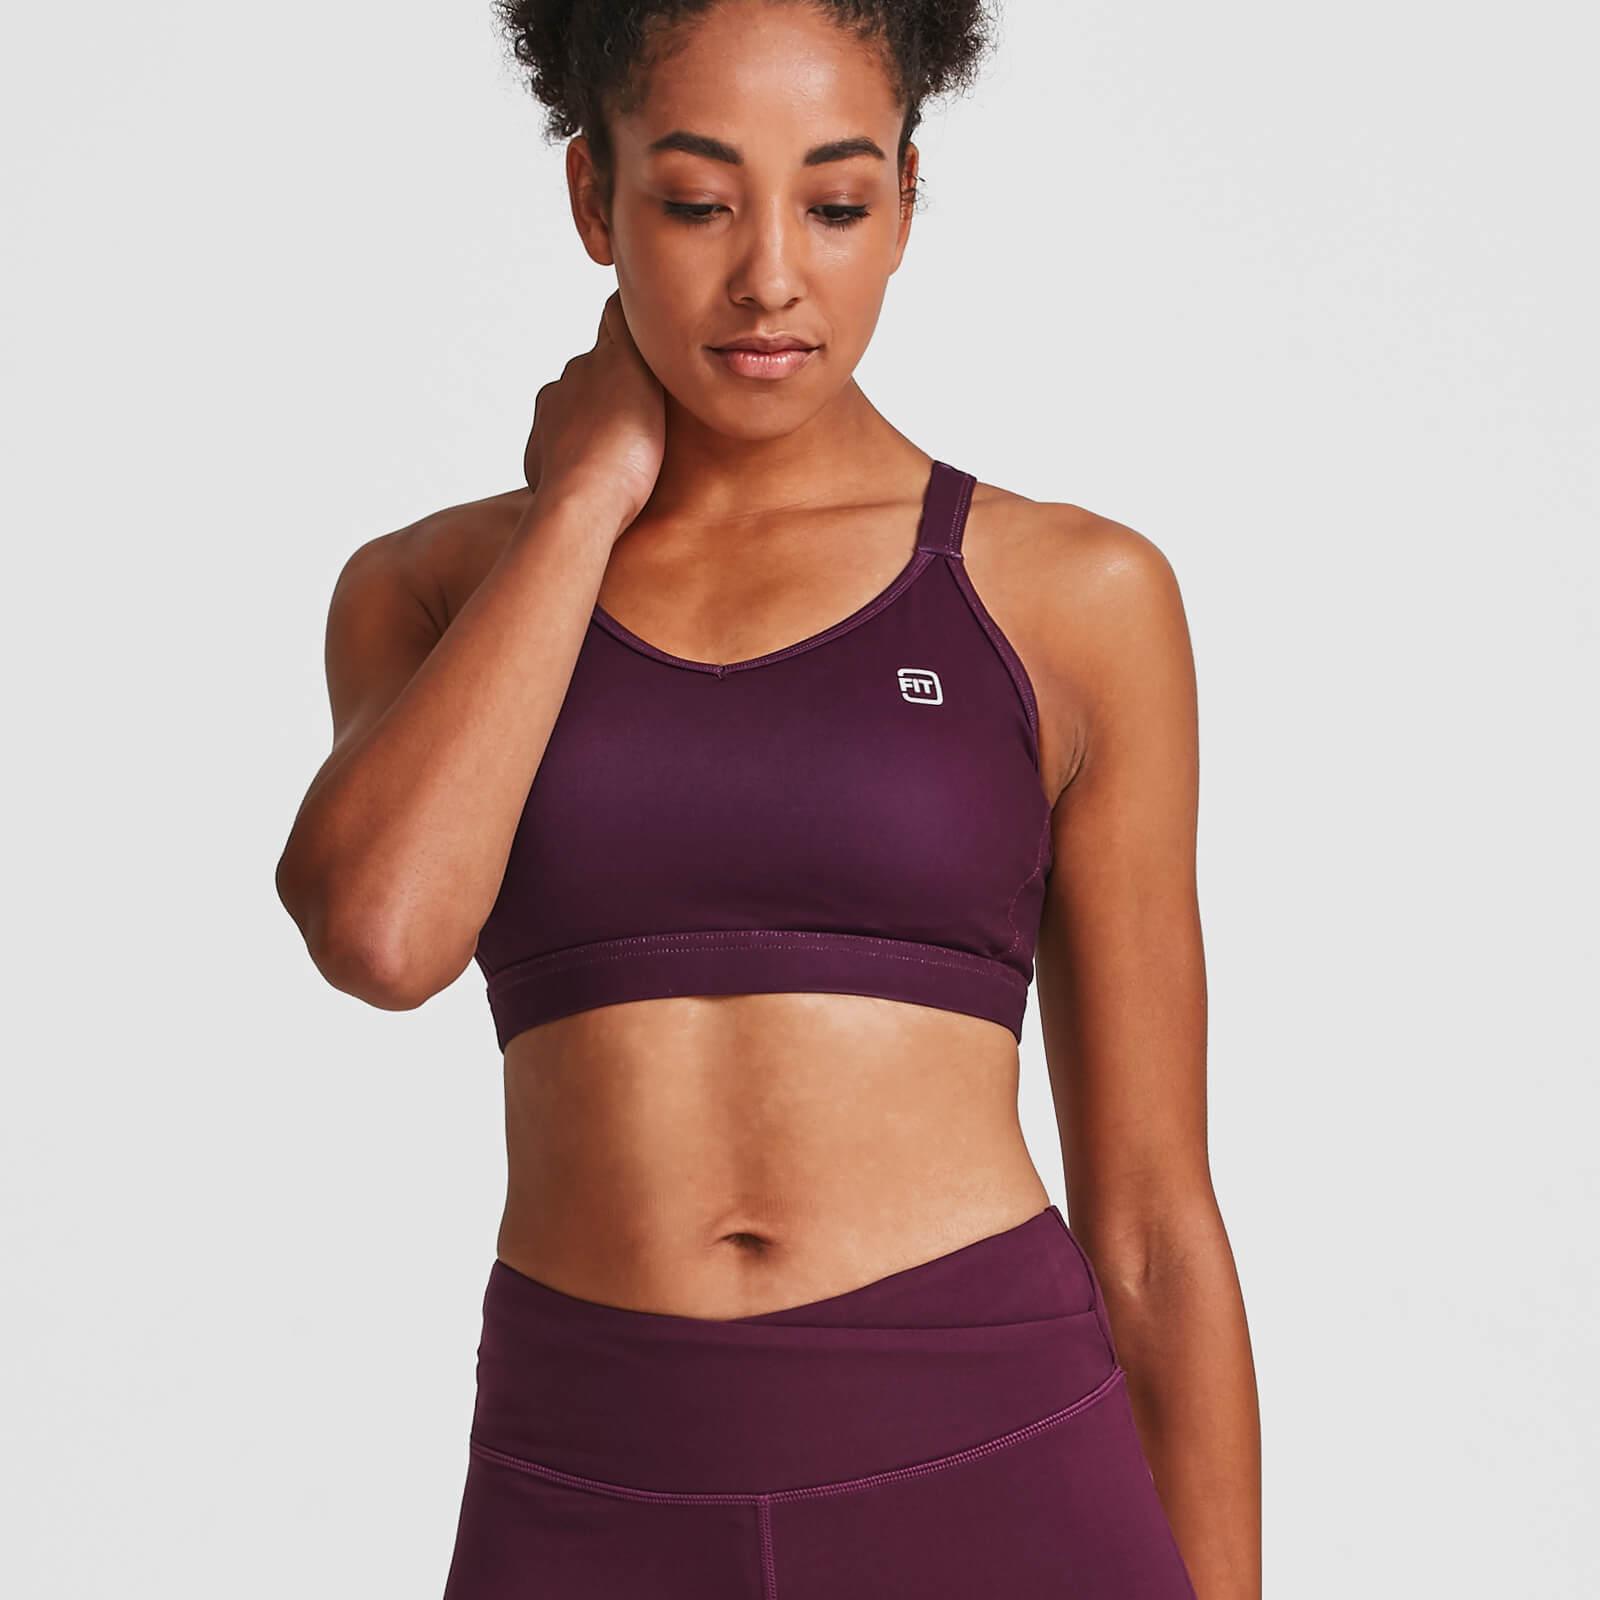 IdealFit Core Sports Bra - Dark Berry - XS - Purple